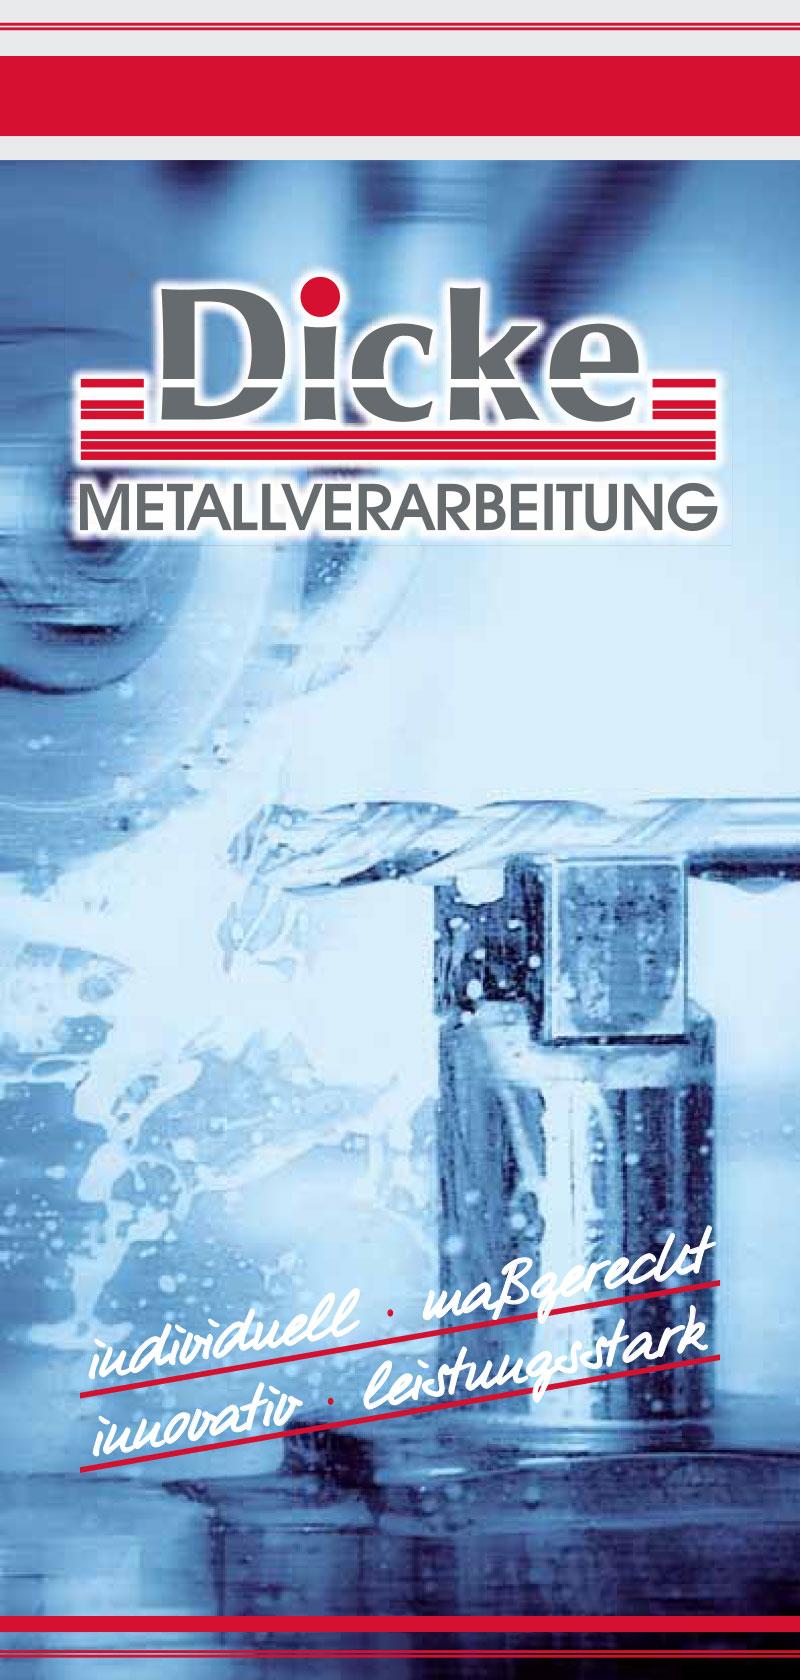 Dicke Metallverarbeitung - Imagebroschüre